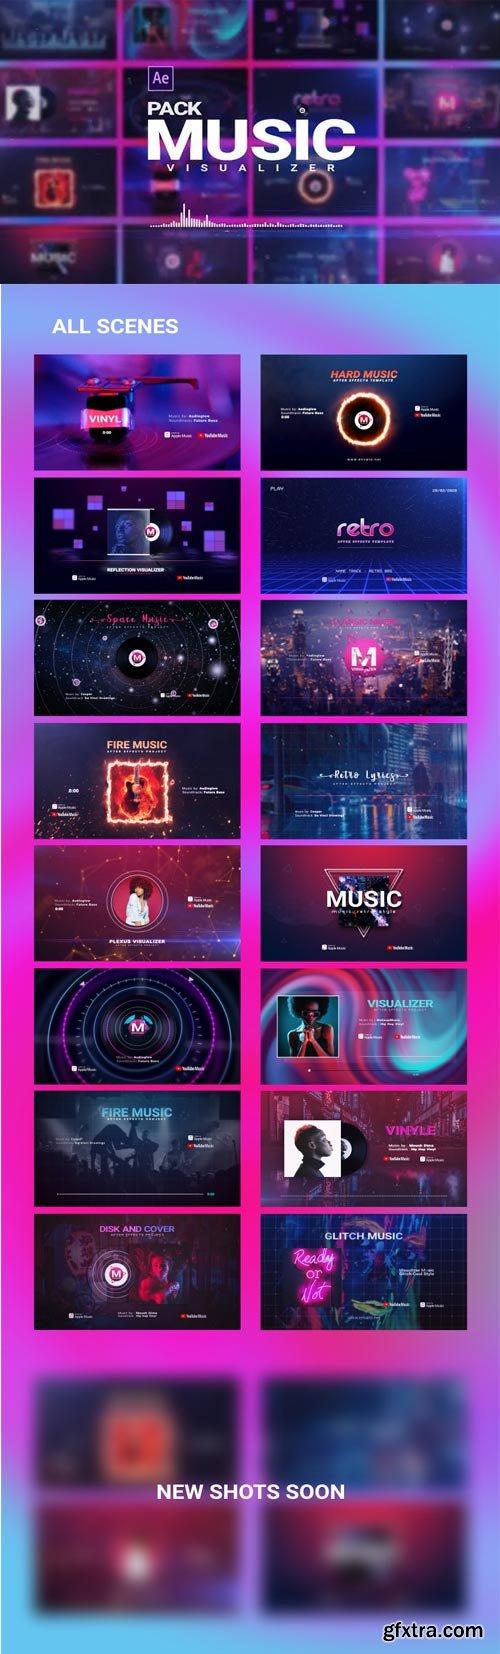 Videohive - Music Visualizer Pack - 26261391